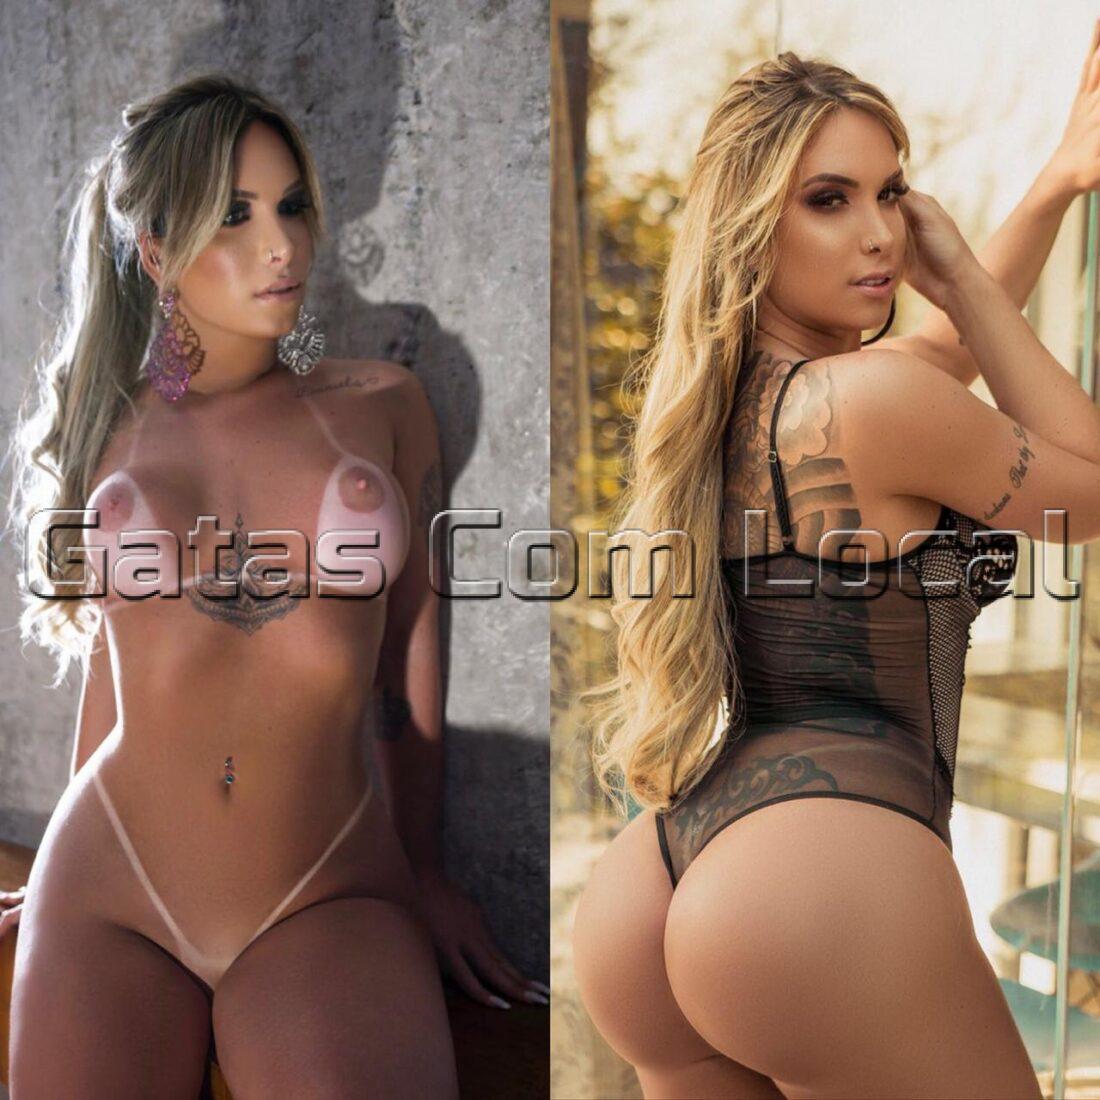 Acompanhantes-travestis-Lages-Bianca-Rodrigues-1-scaled Bianca Rodrigues